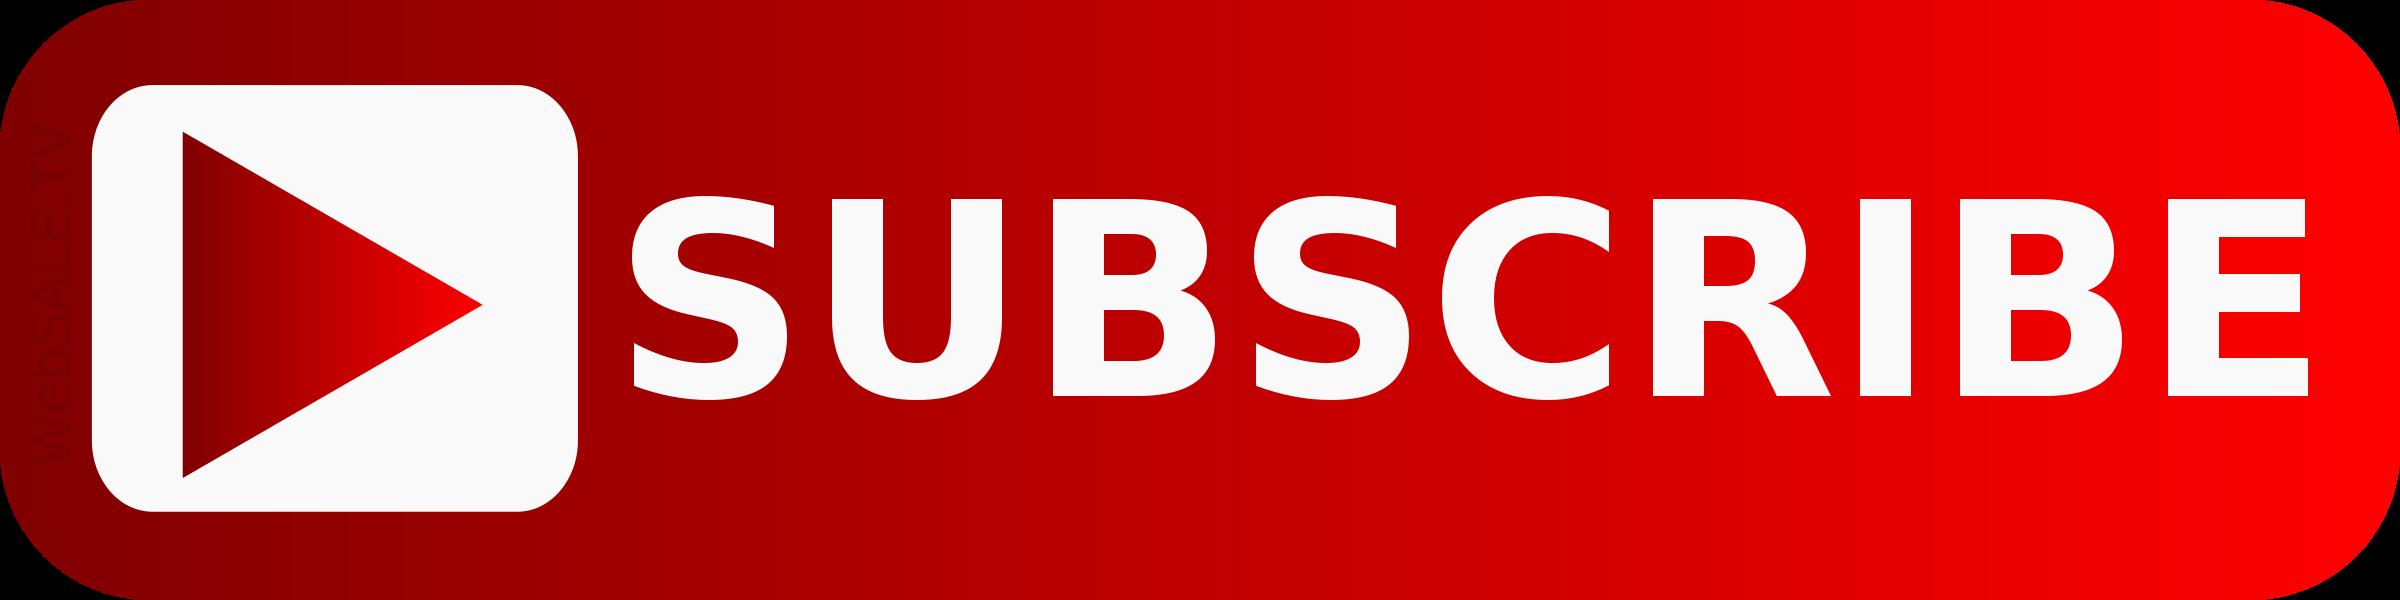 Cutetrick Youtube Logo Buy Youtube Subscribers Youtube Subscribers